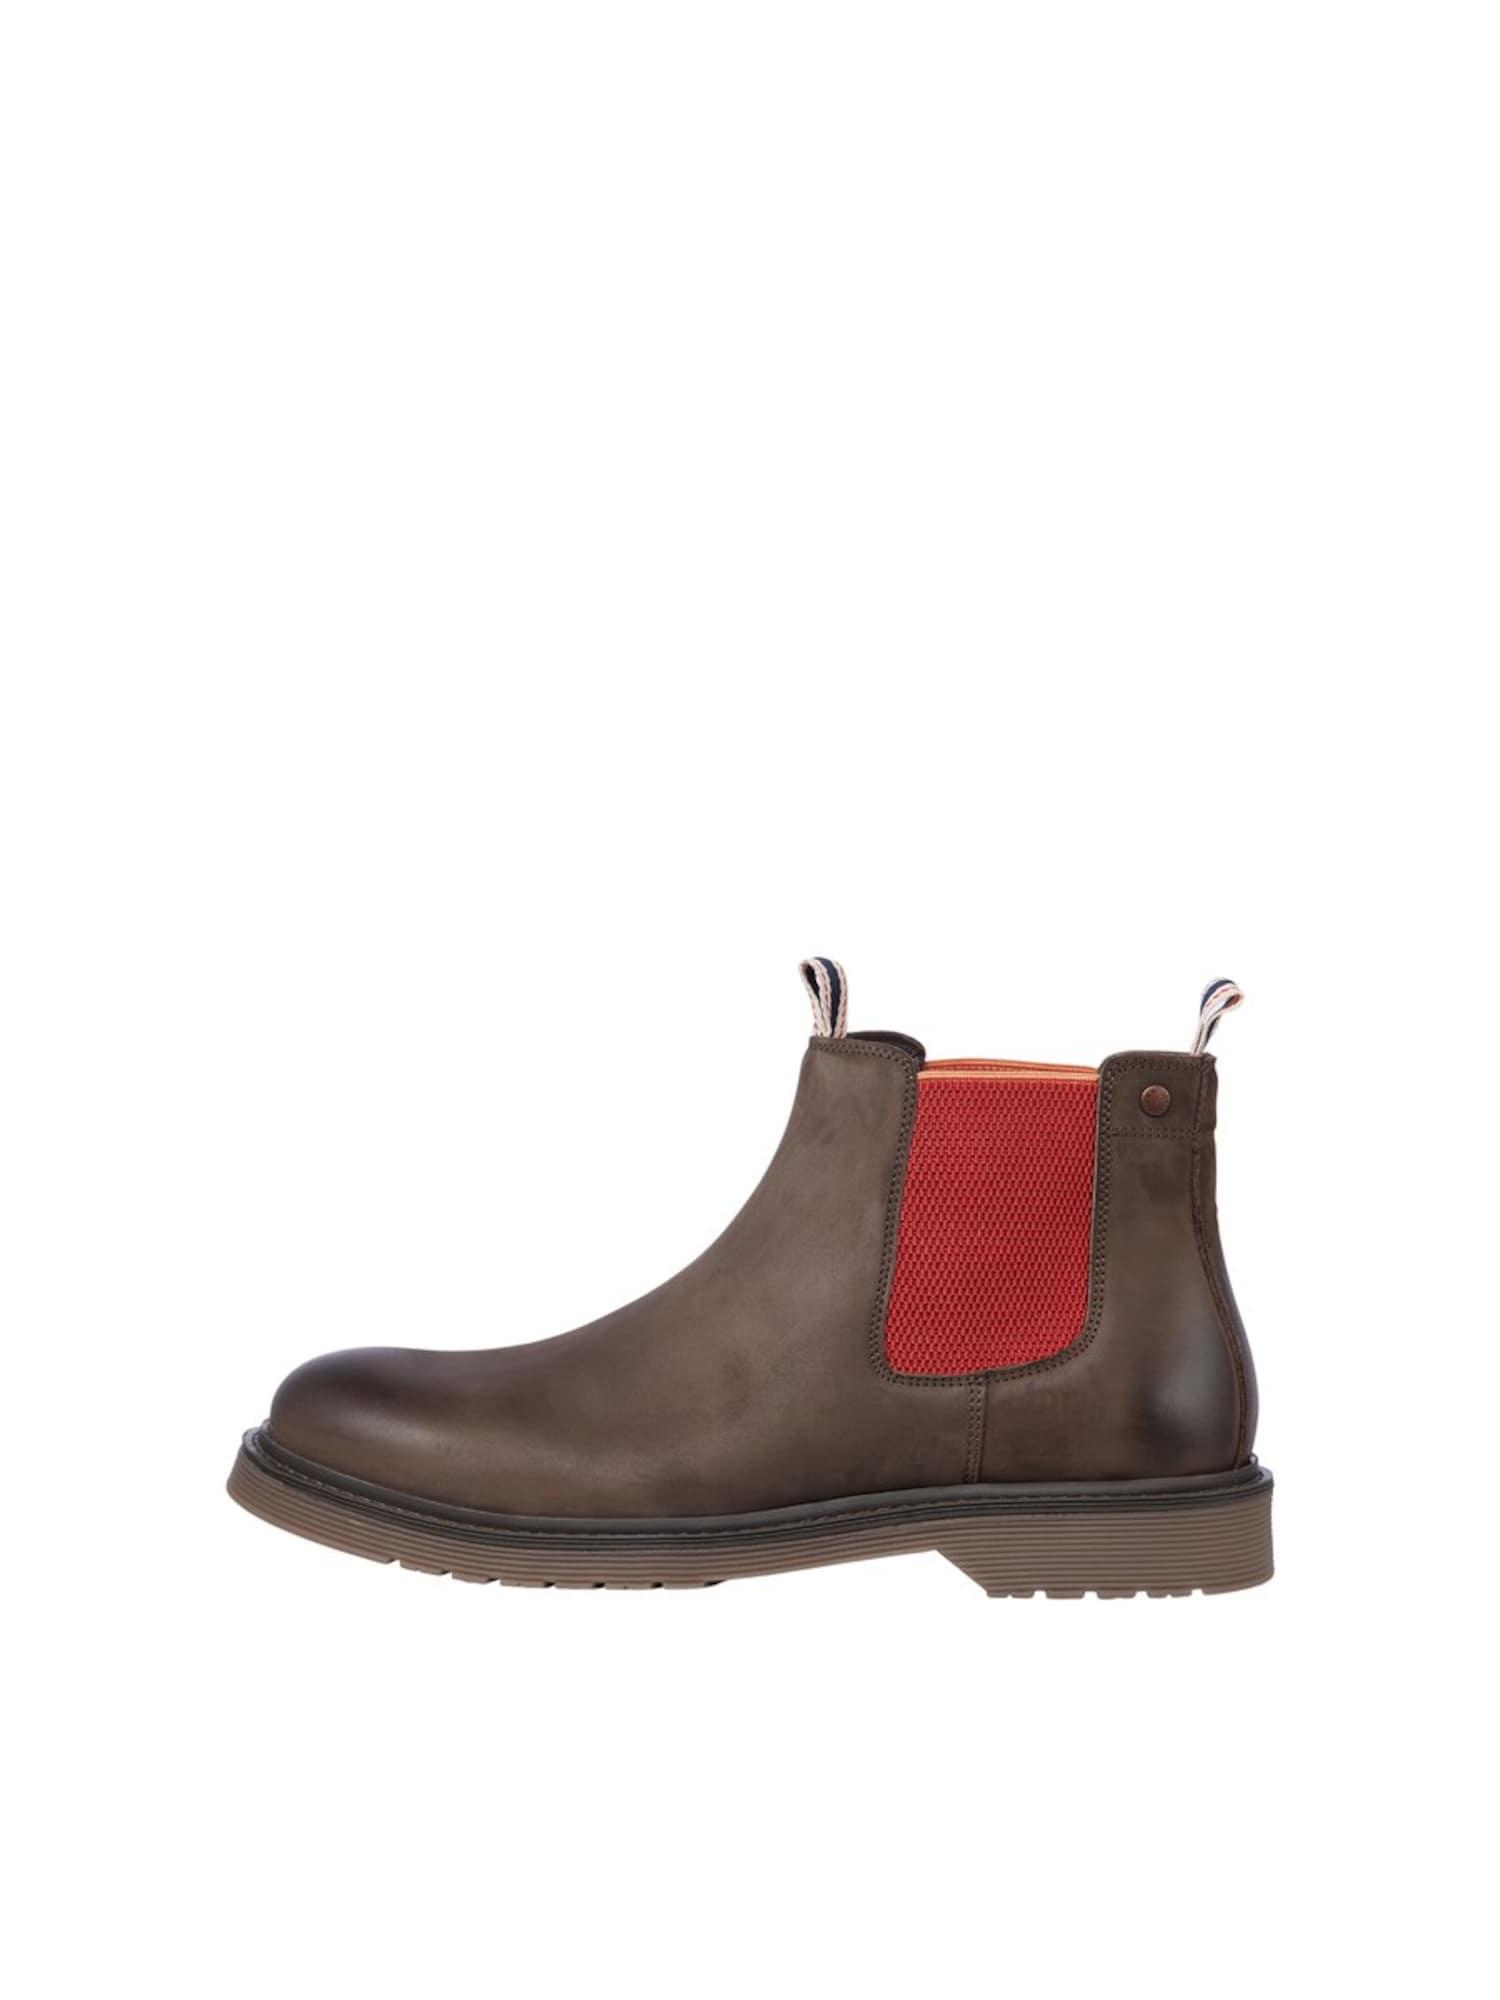 "JACK & JONES ""Chelsea"" batai margai ruda / raudona"